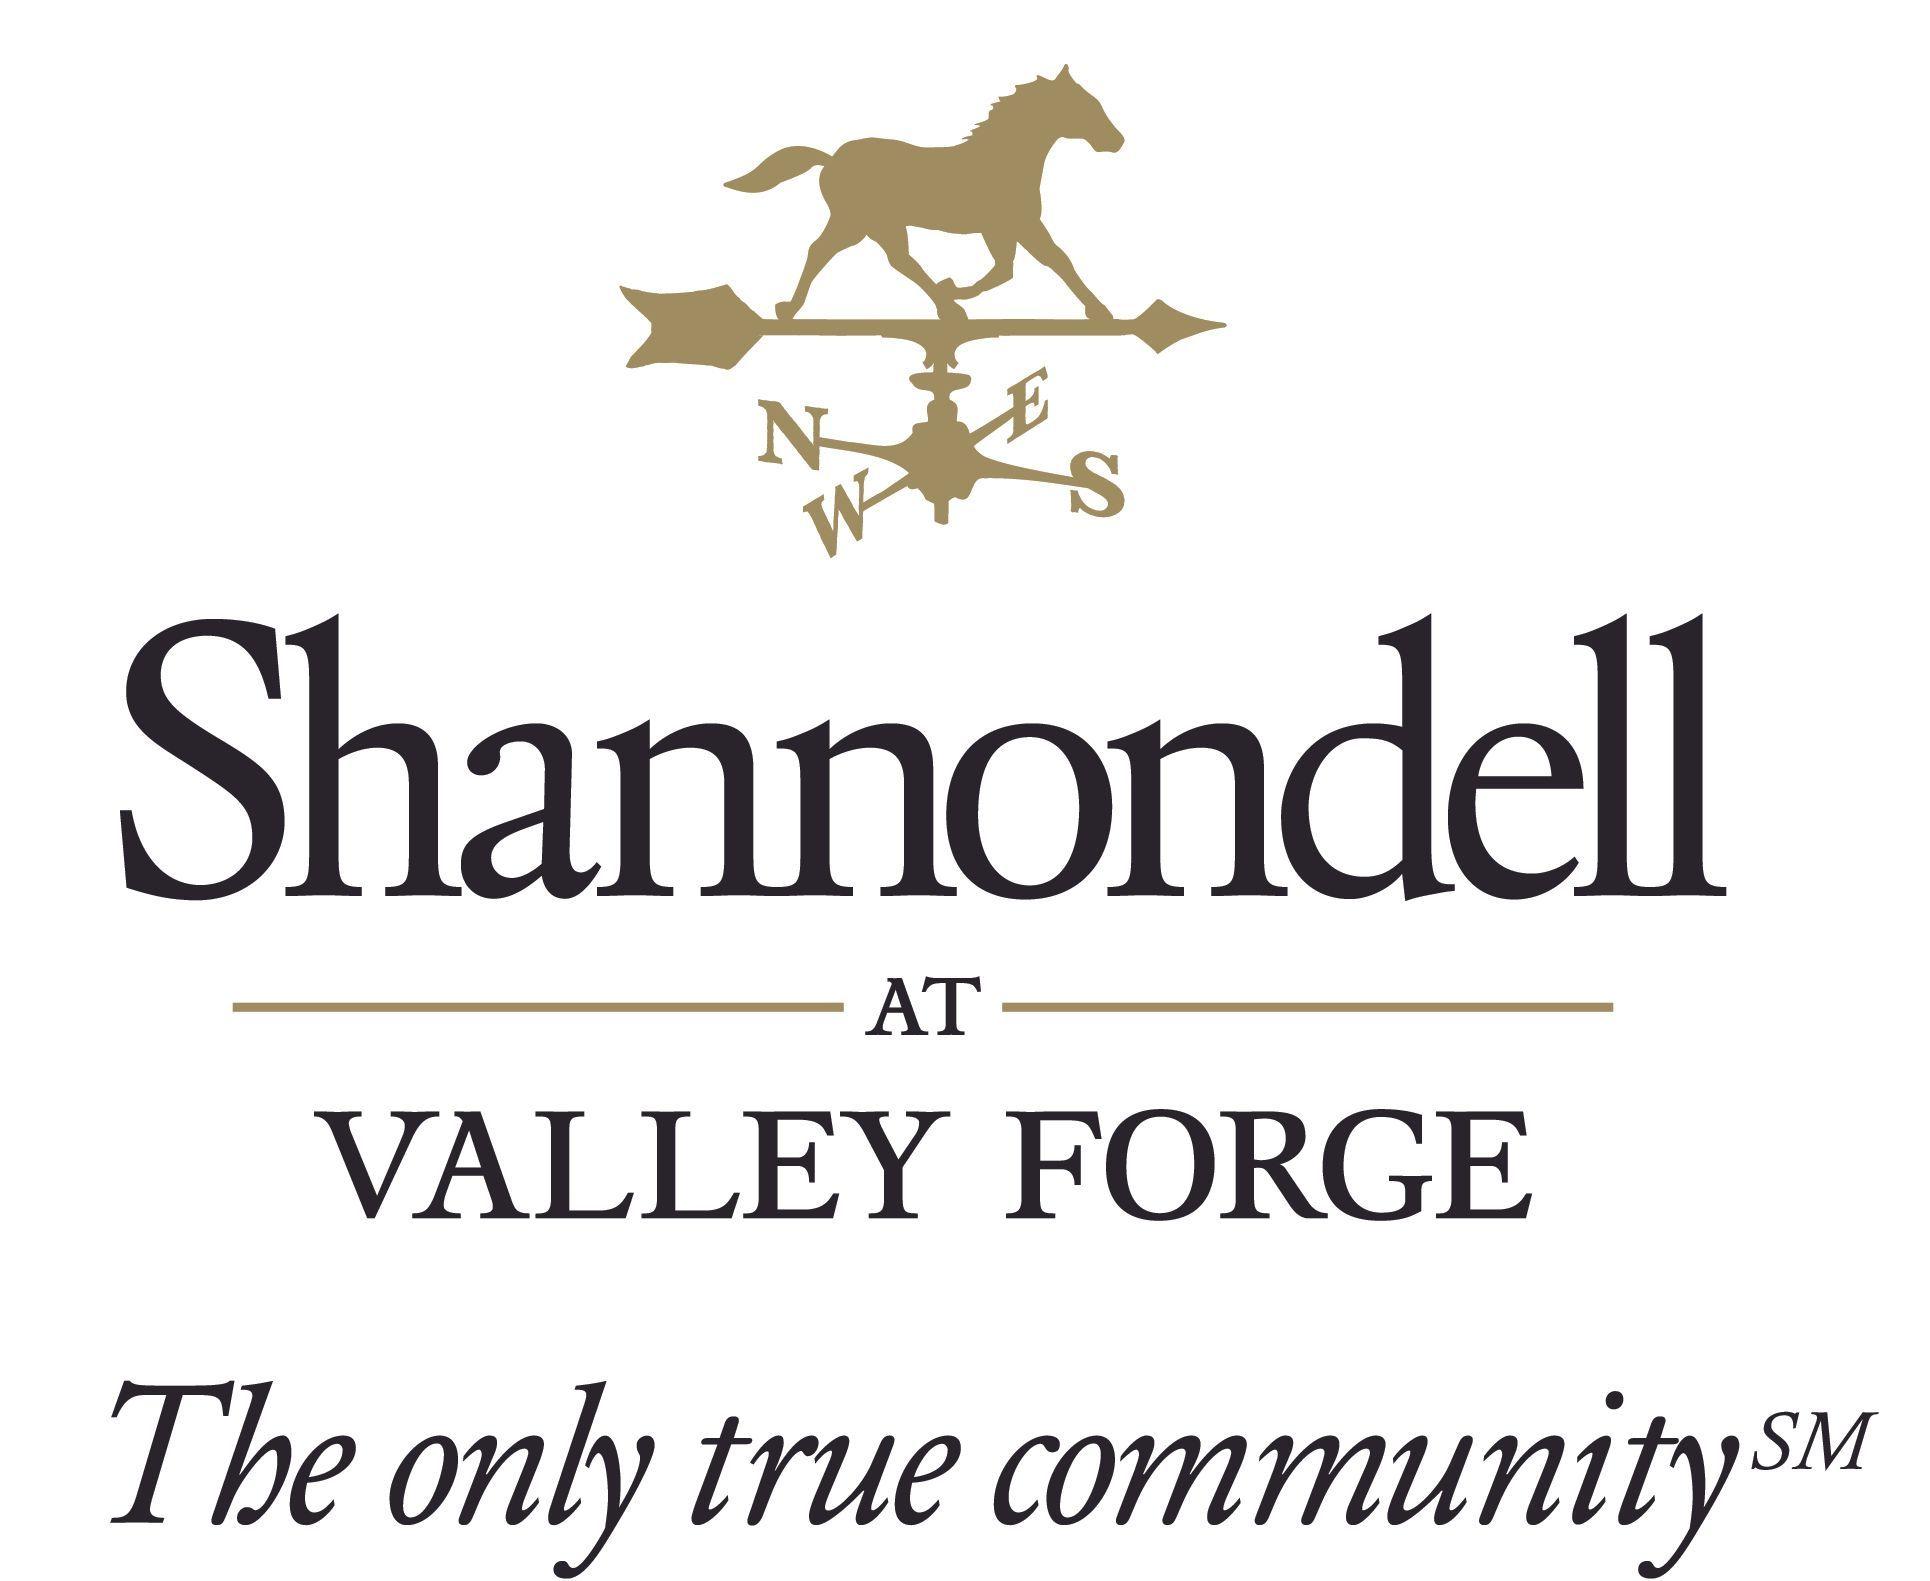 Shannondell